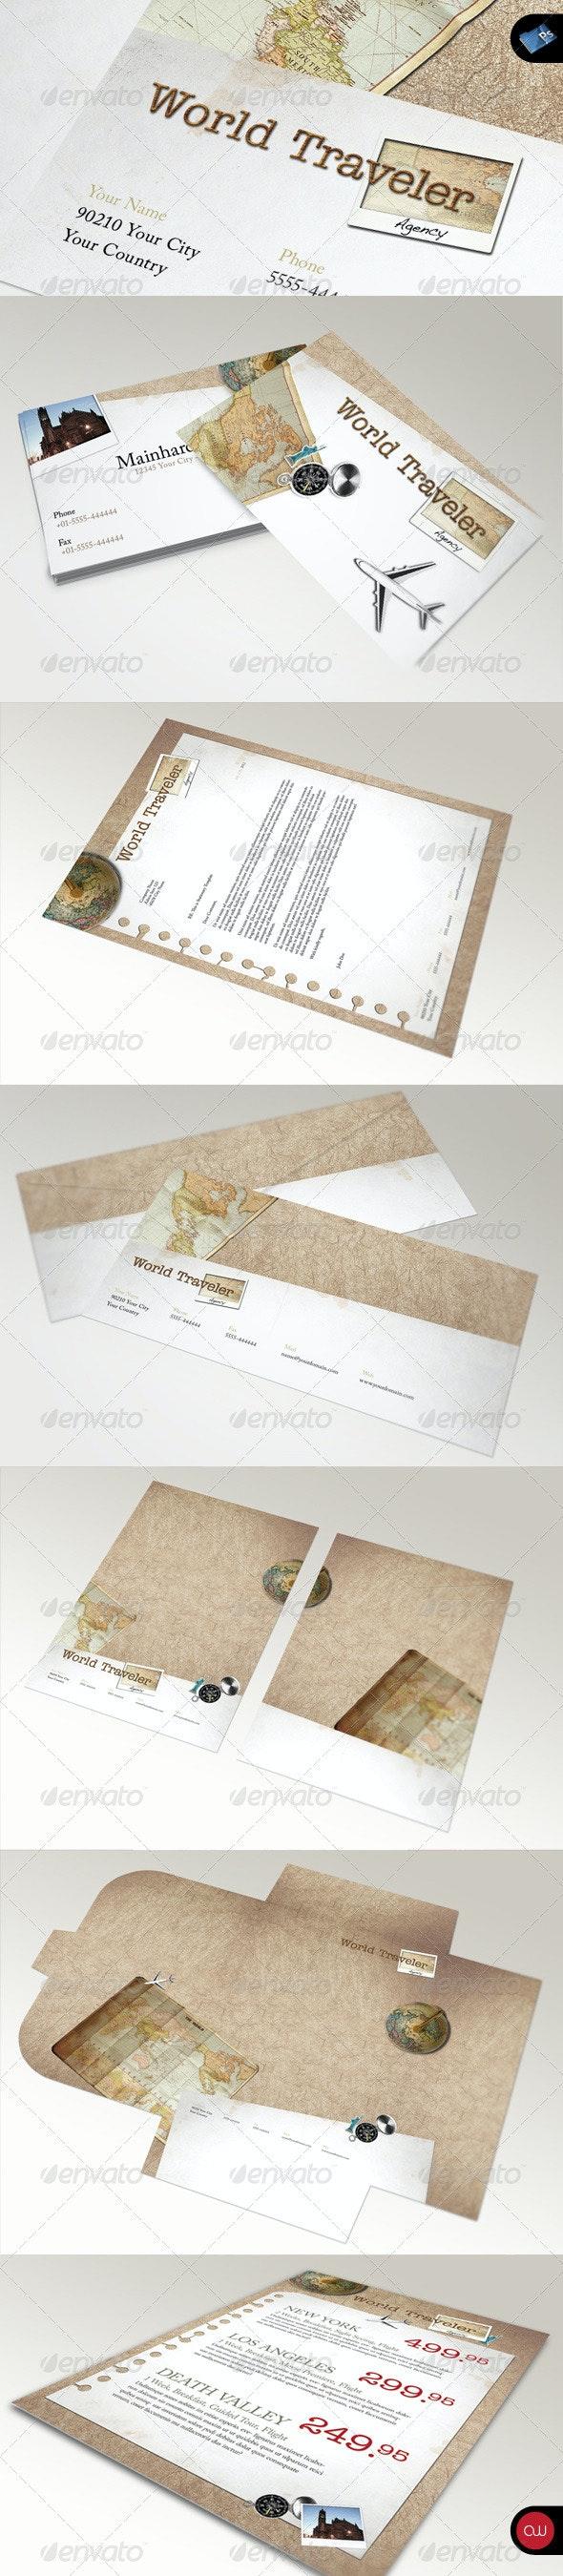 Retro Stationary Template - Vol.1 - Stationery Print Templates